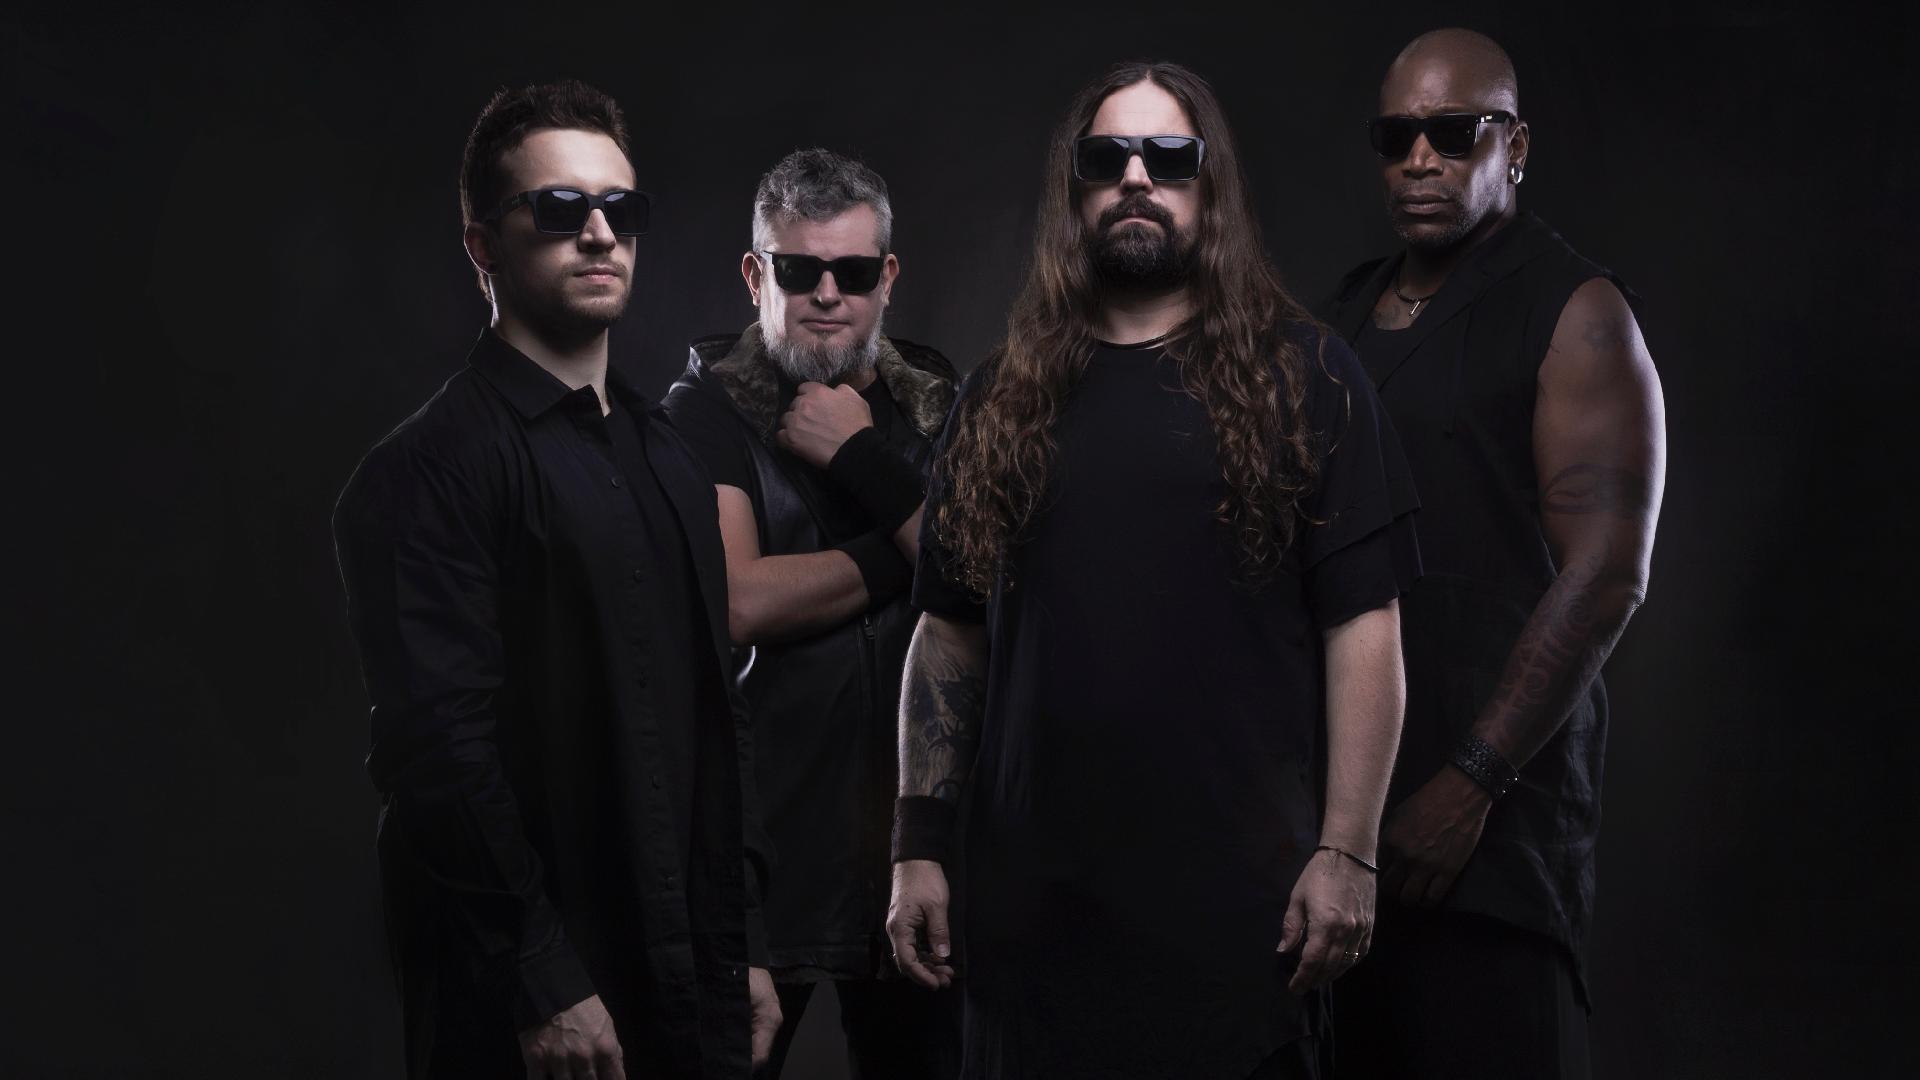 Sepultura é formado por Eloy Casagrande (bateria), Paulo Jr. (baixo), Andreas Kisser (guitarra) e Derrick Green (vocal)